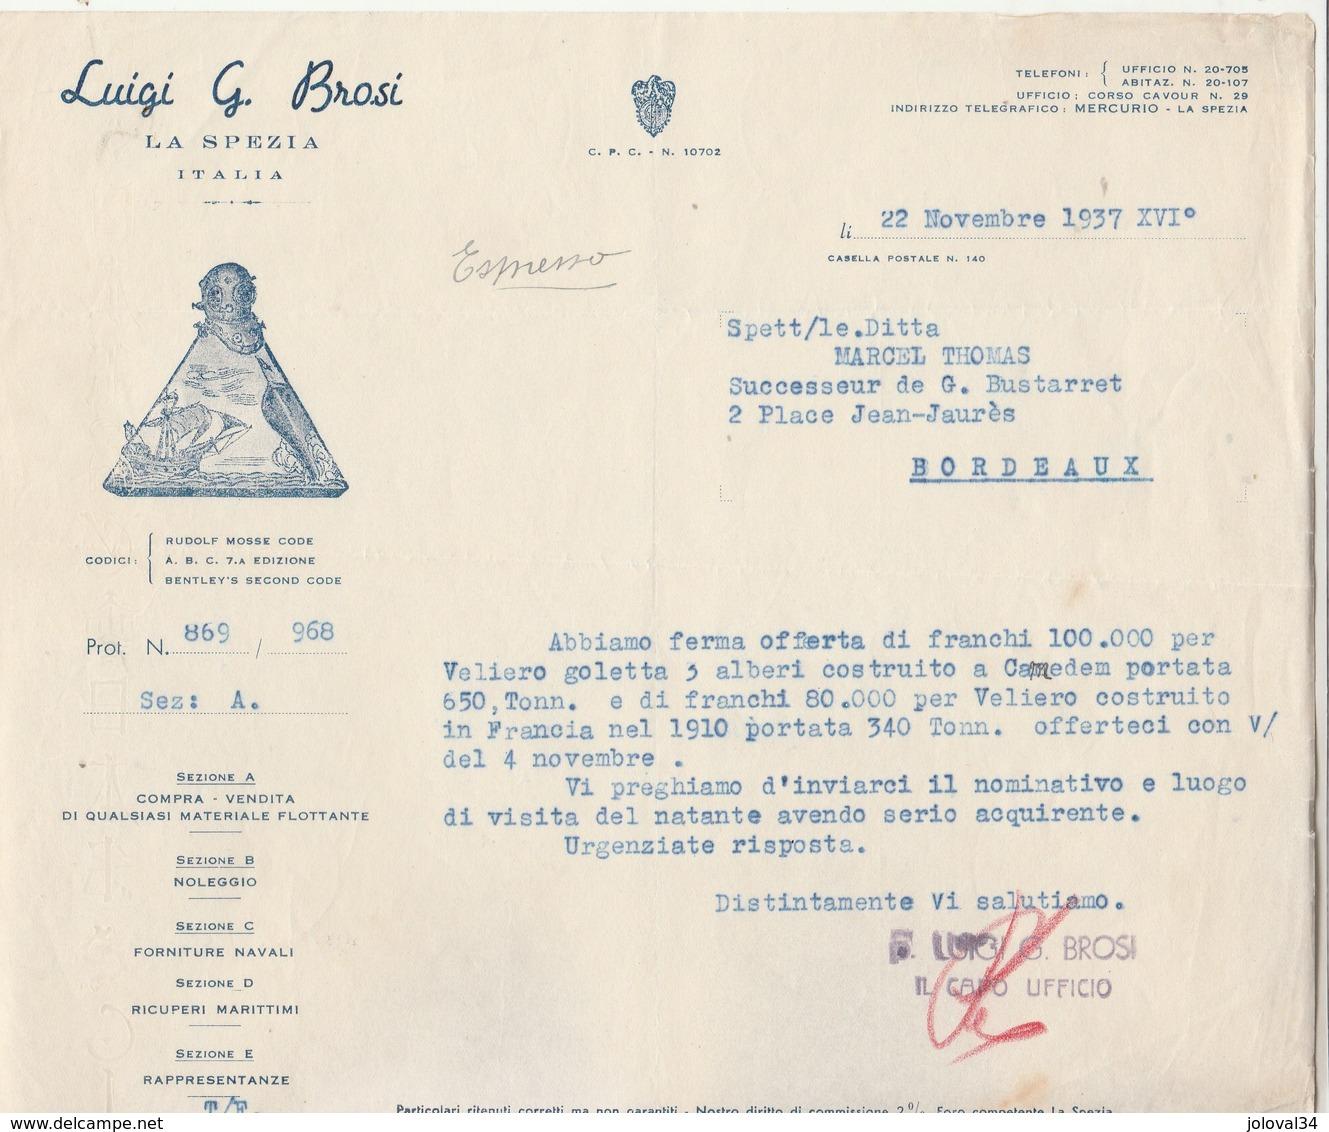 Italie Facture Lettre Illustrée Bateau 22/11/1937 Luigi G Brosi LA SPEZIA - Fournitures Navales Matériel Flottant - Italie